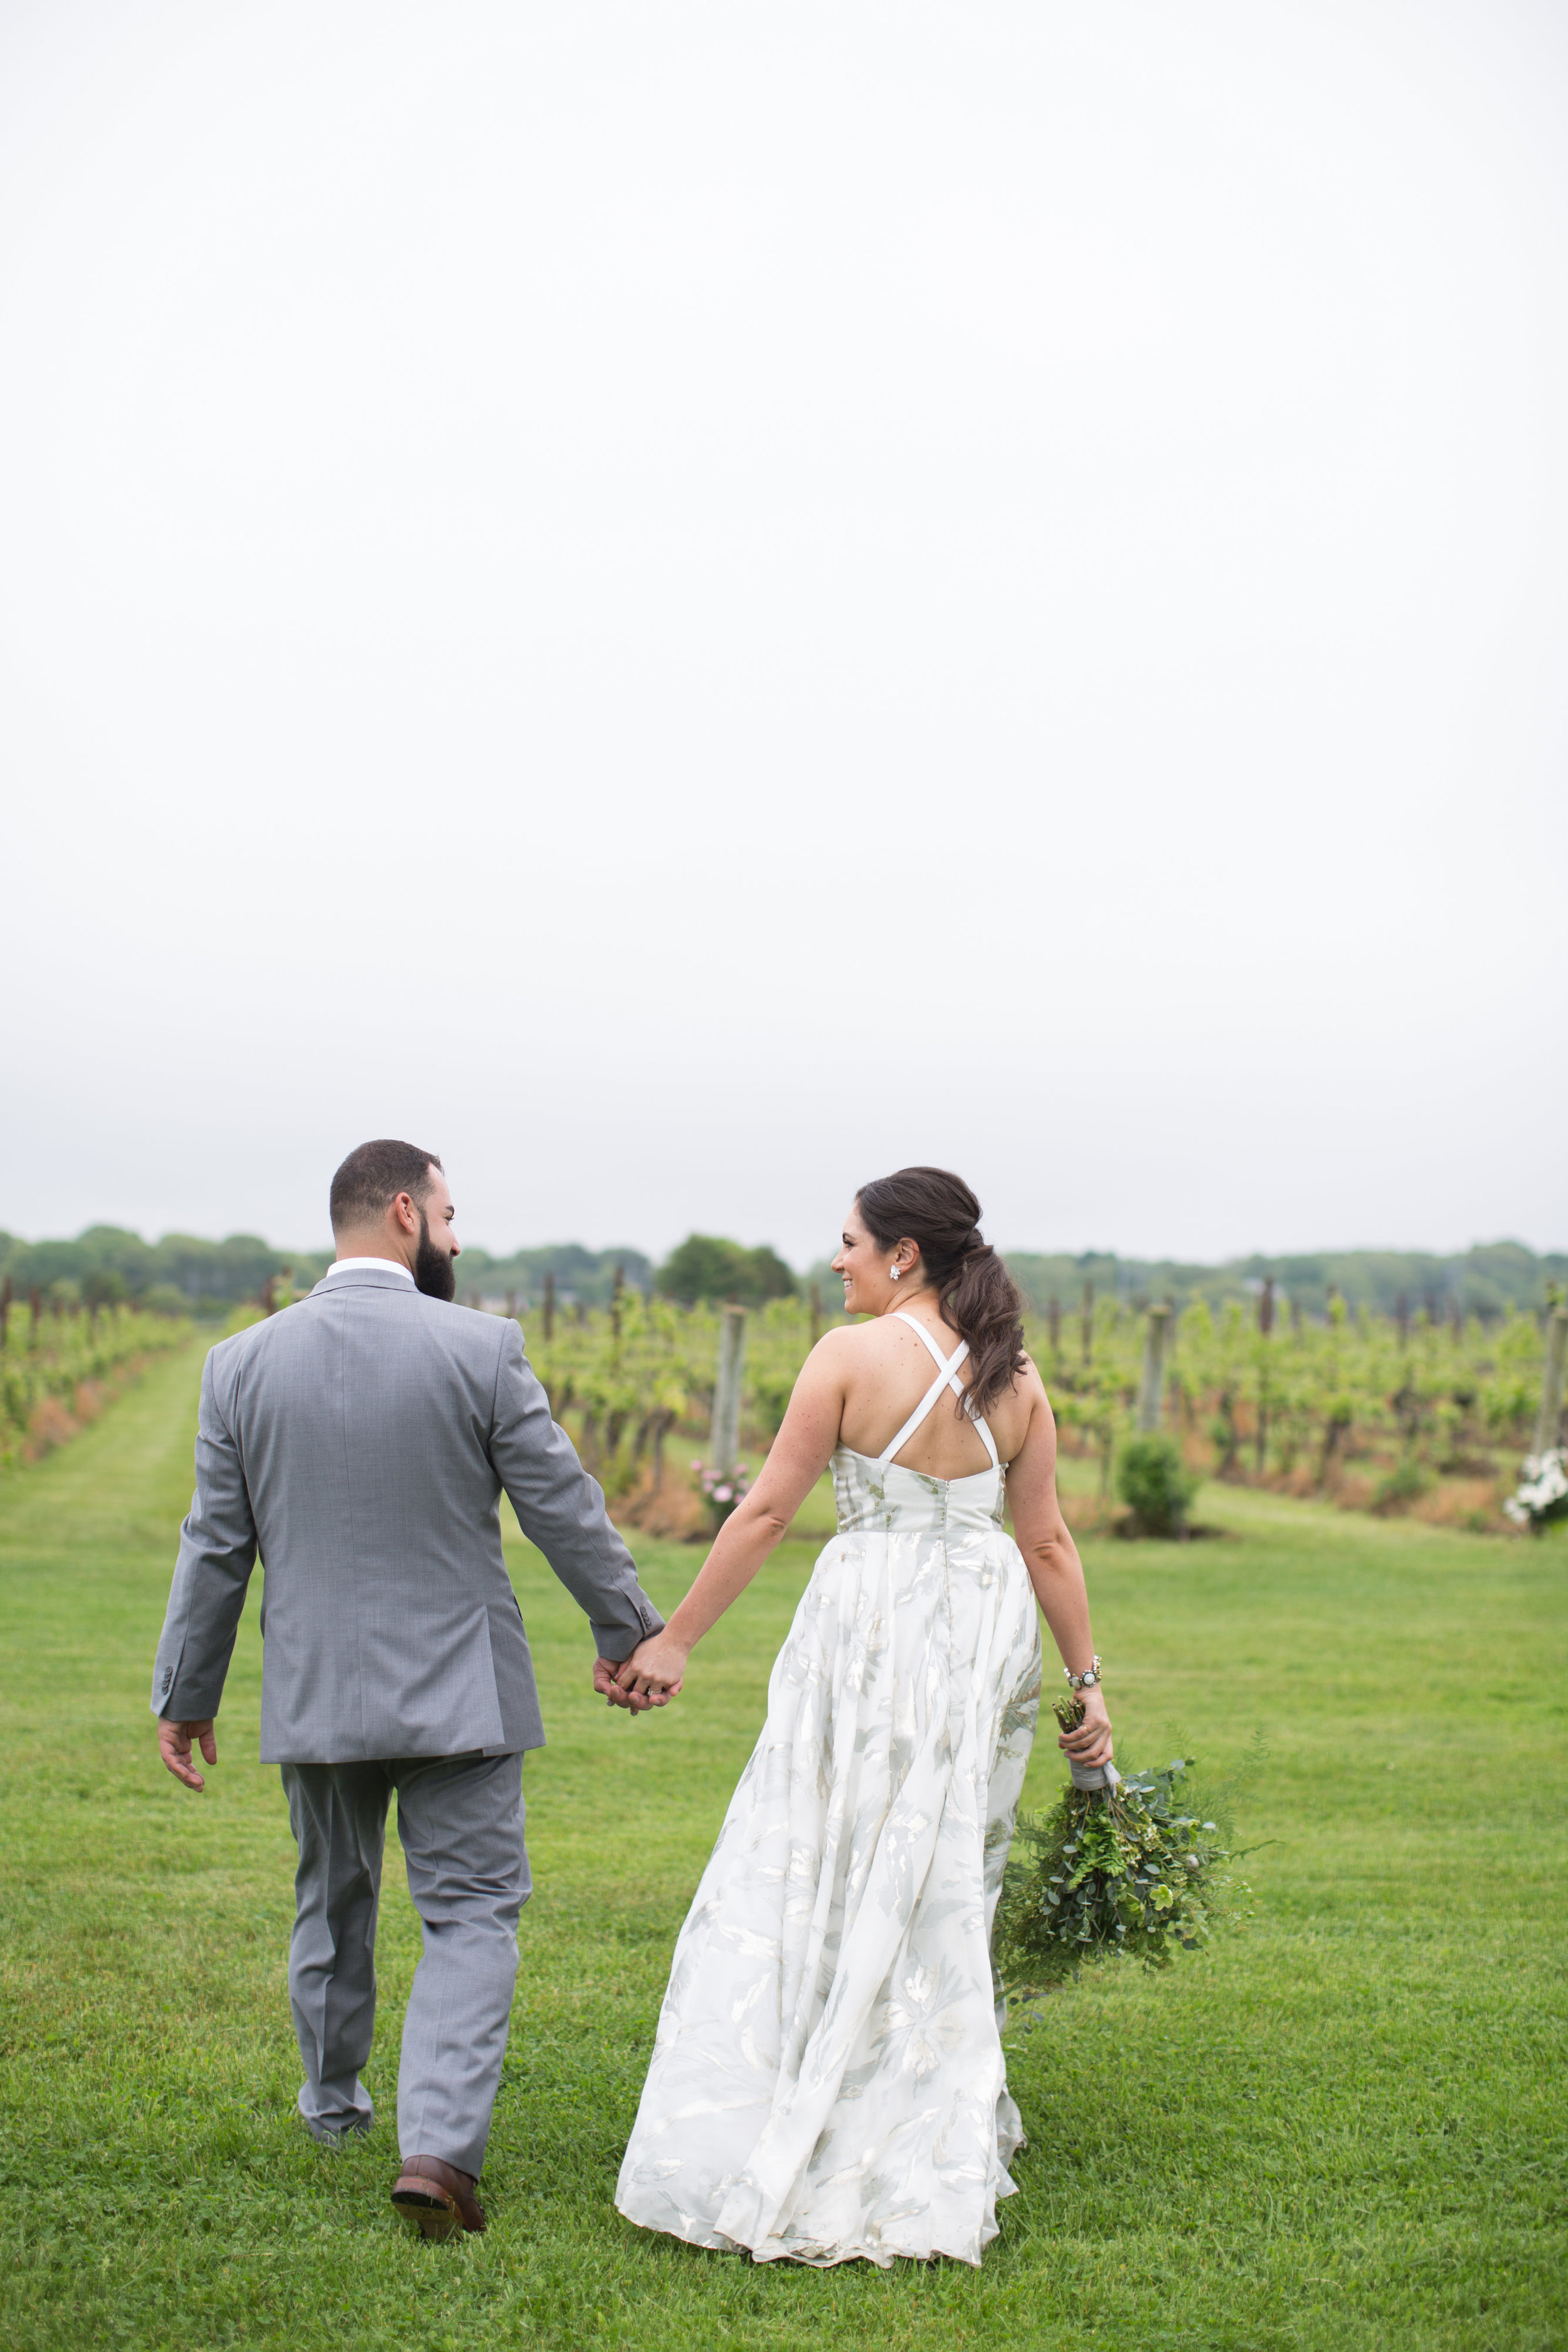 Nicole & Mike, June 1, 2018